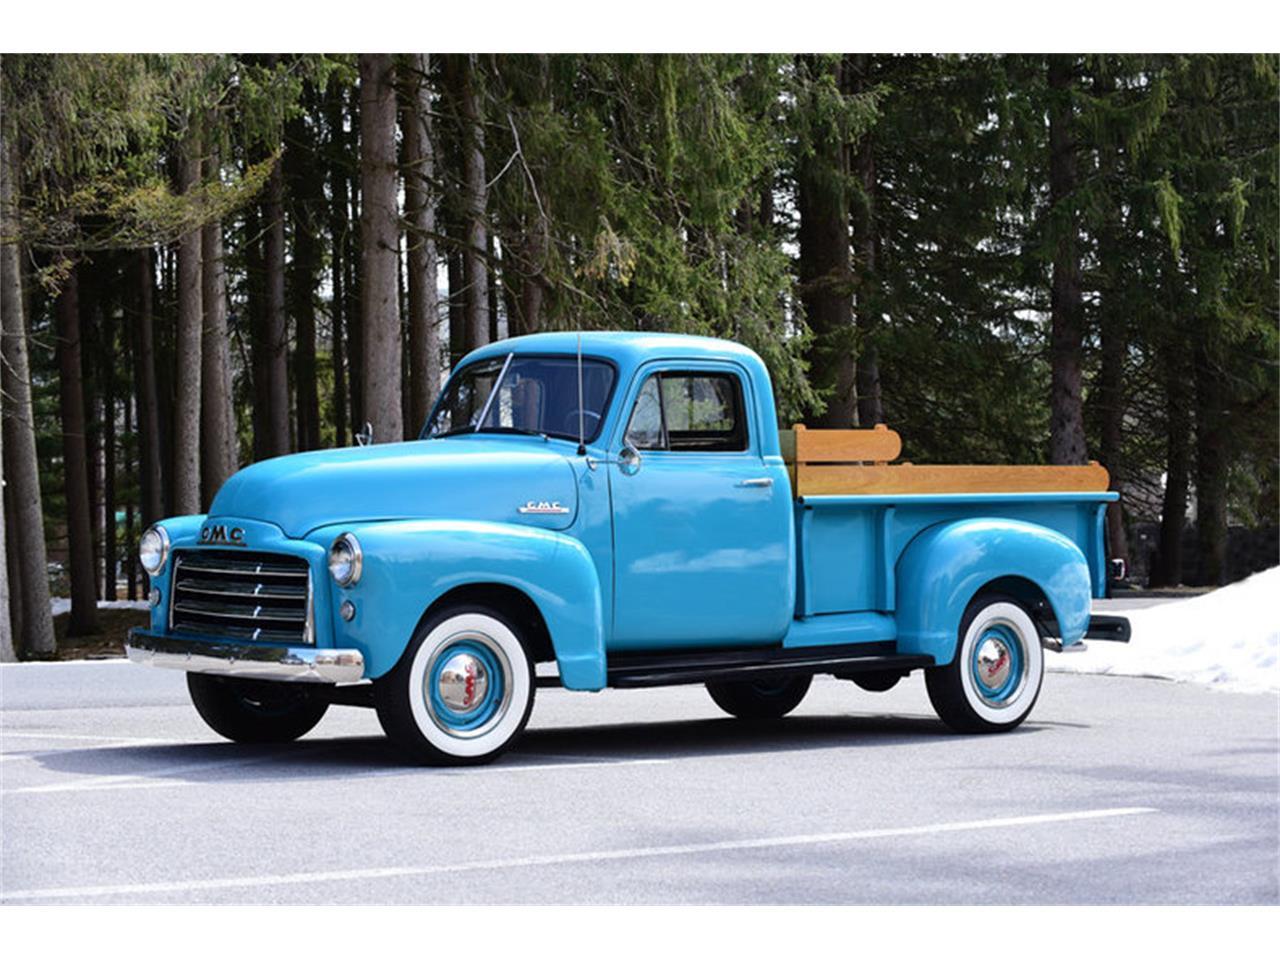 1951 Gmc 3 4 Ton Pickup For Sale Classiccars Com Cc 994977